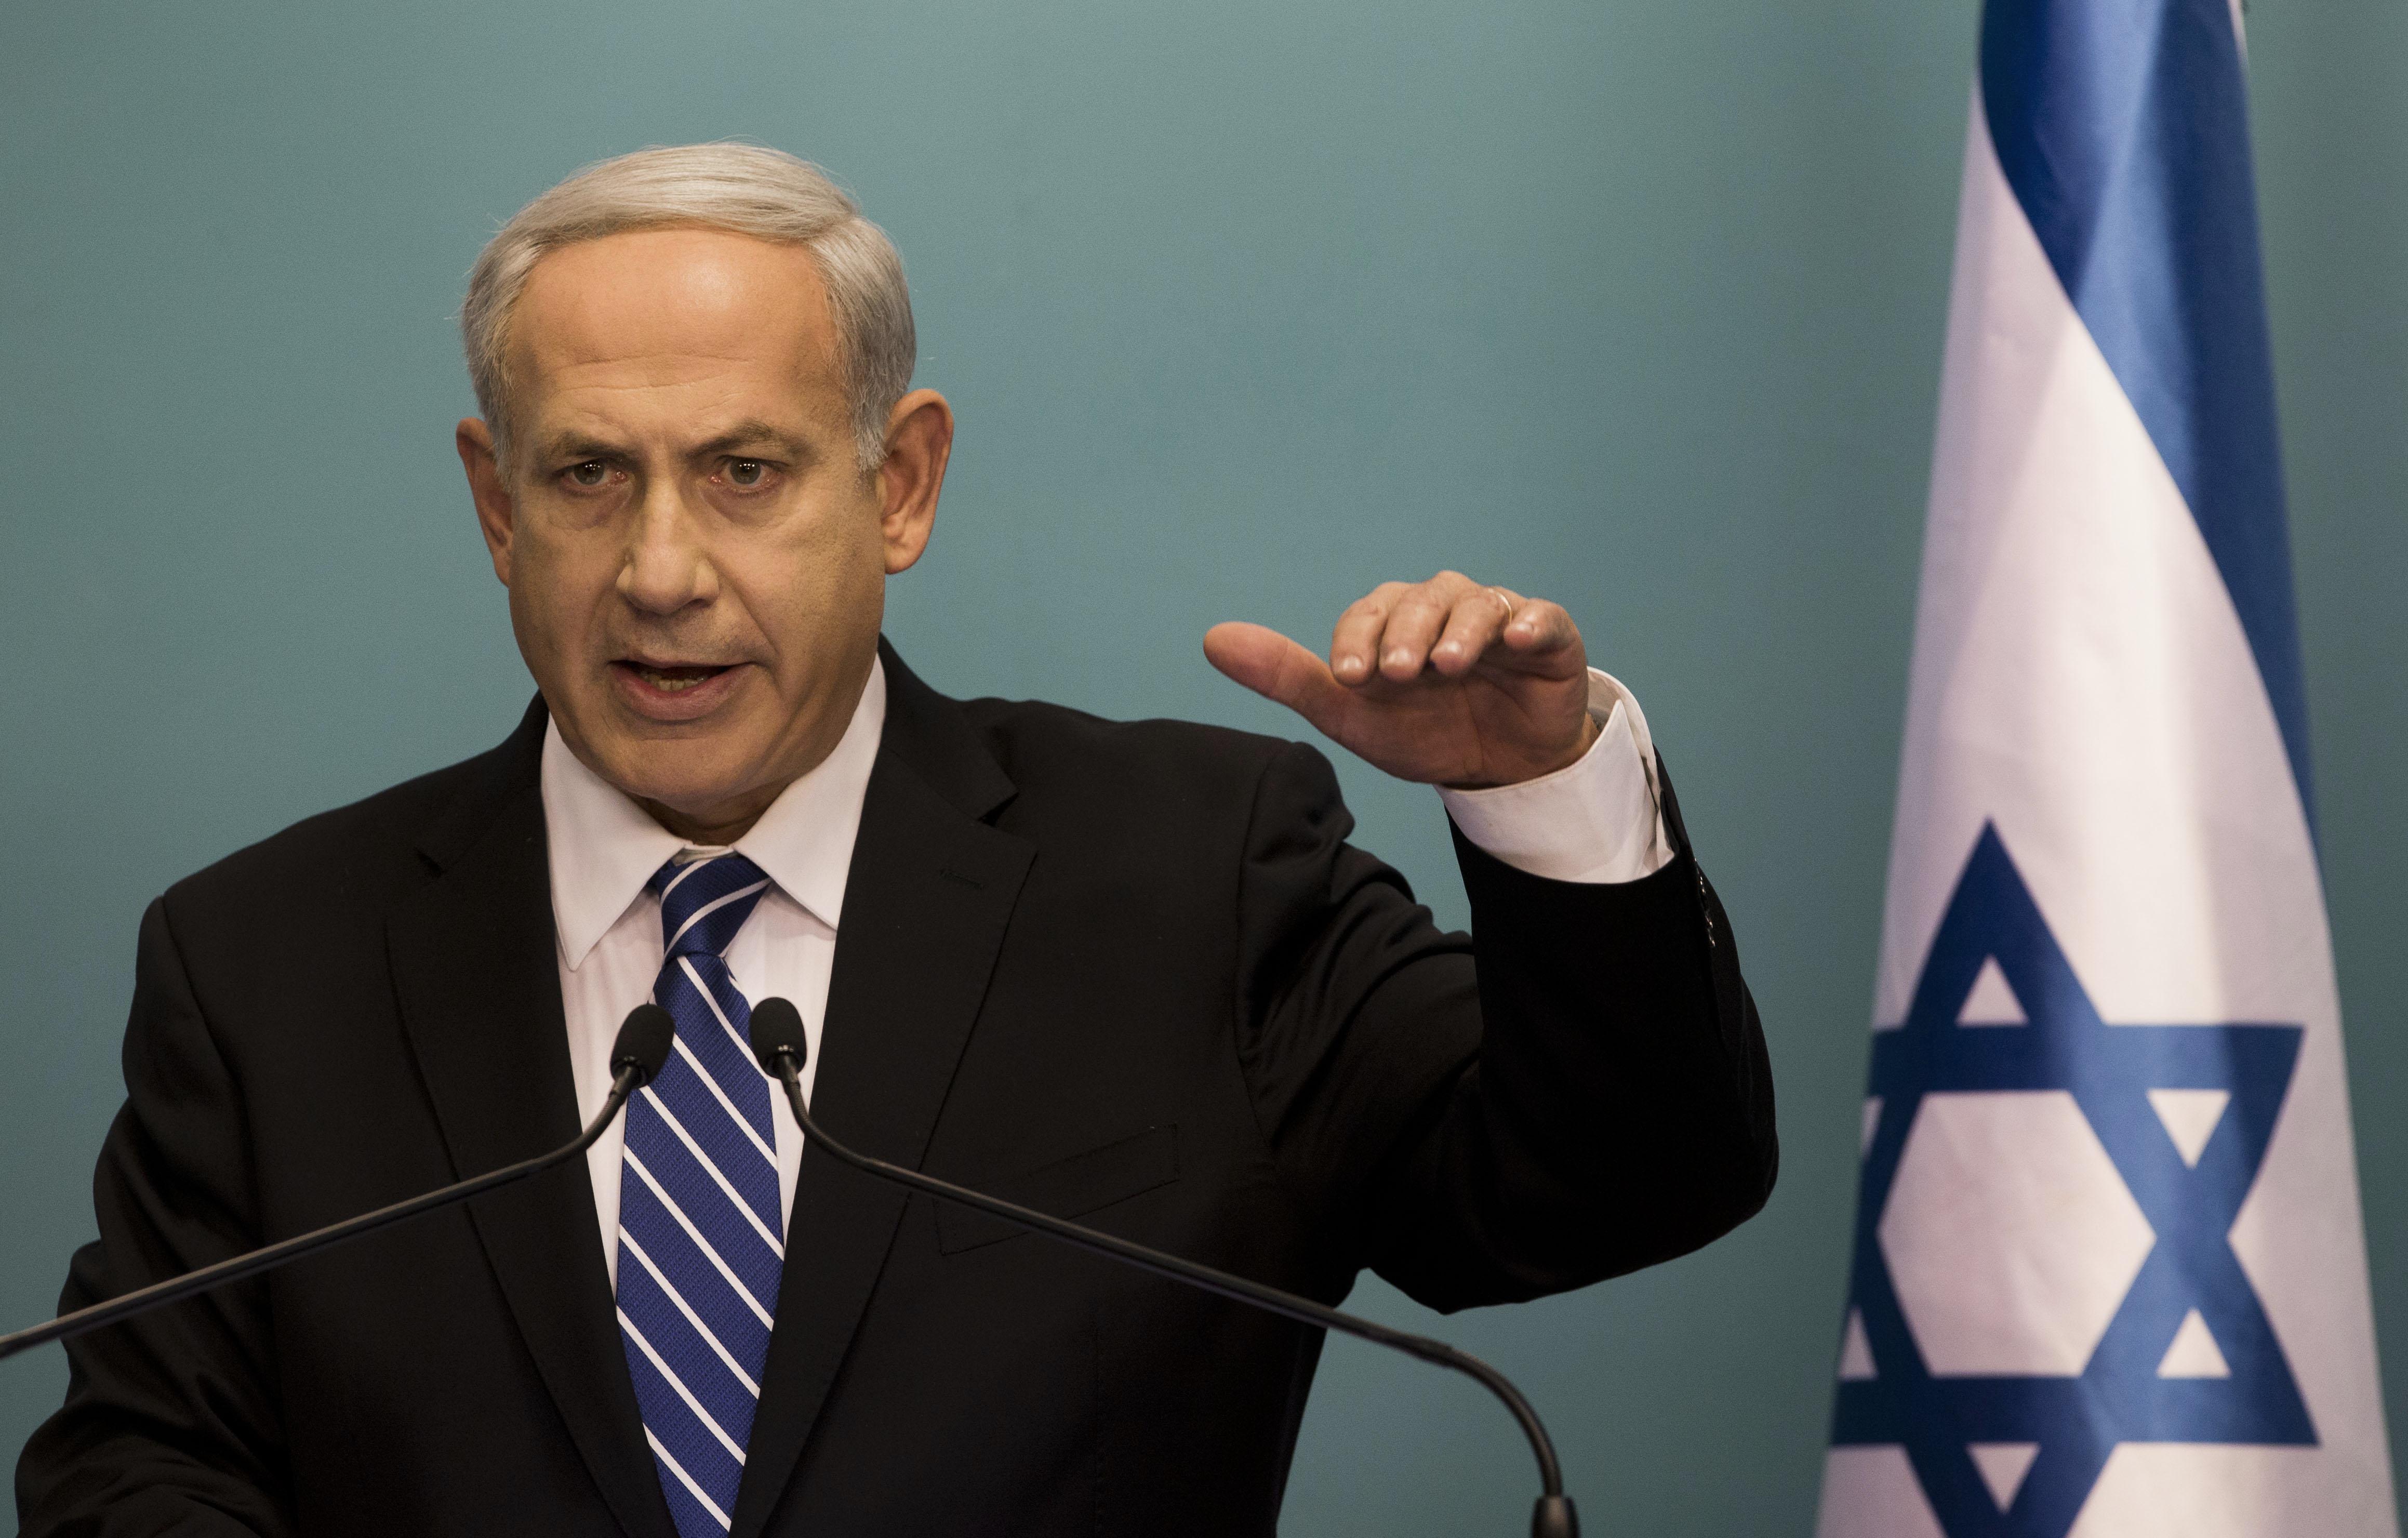 Benjamin Netanyahu. Foto : kielarowski.net